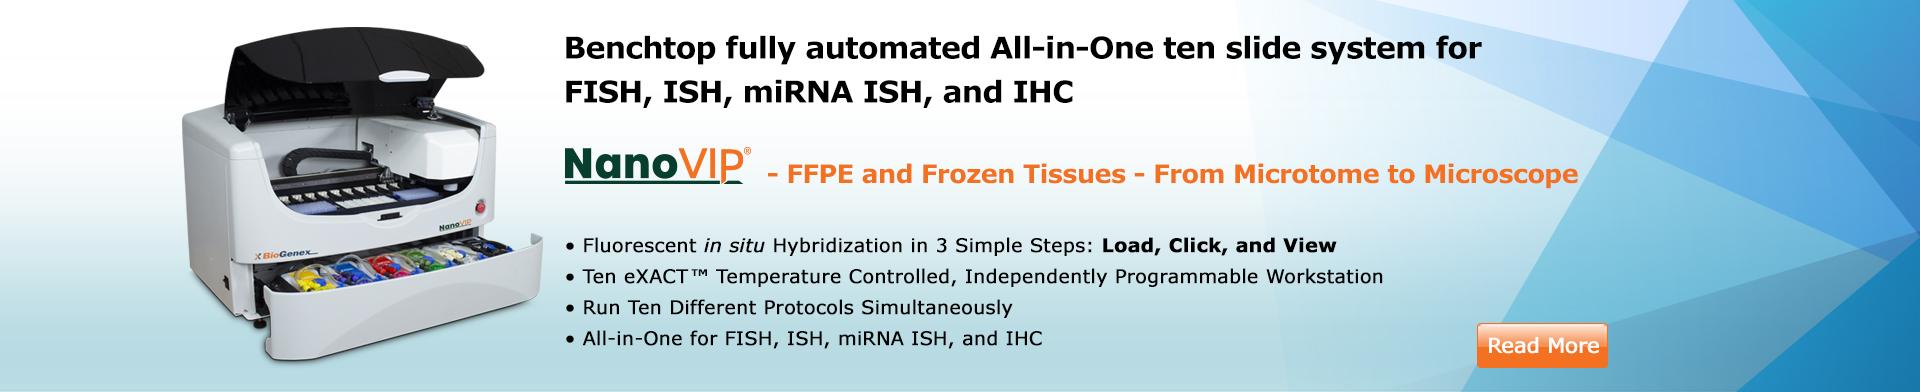 Fluorescence In Situ Hybridization (FISH)/ISH/miRNA/In Situ PCR Automated Instrument